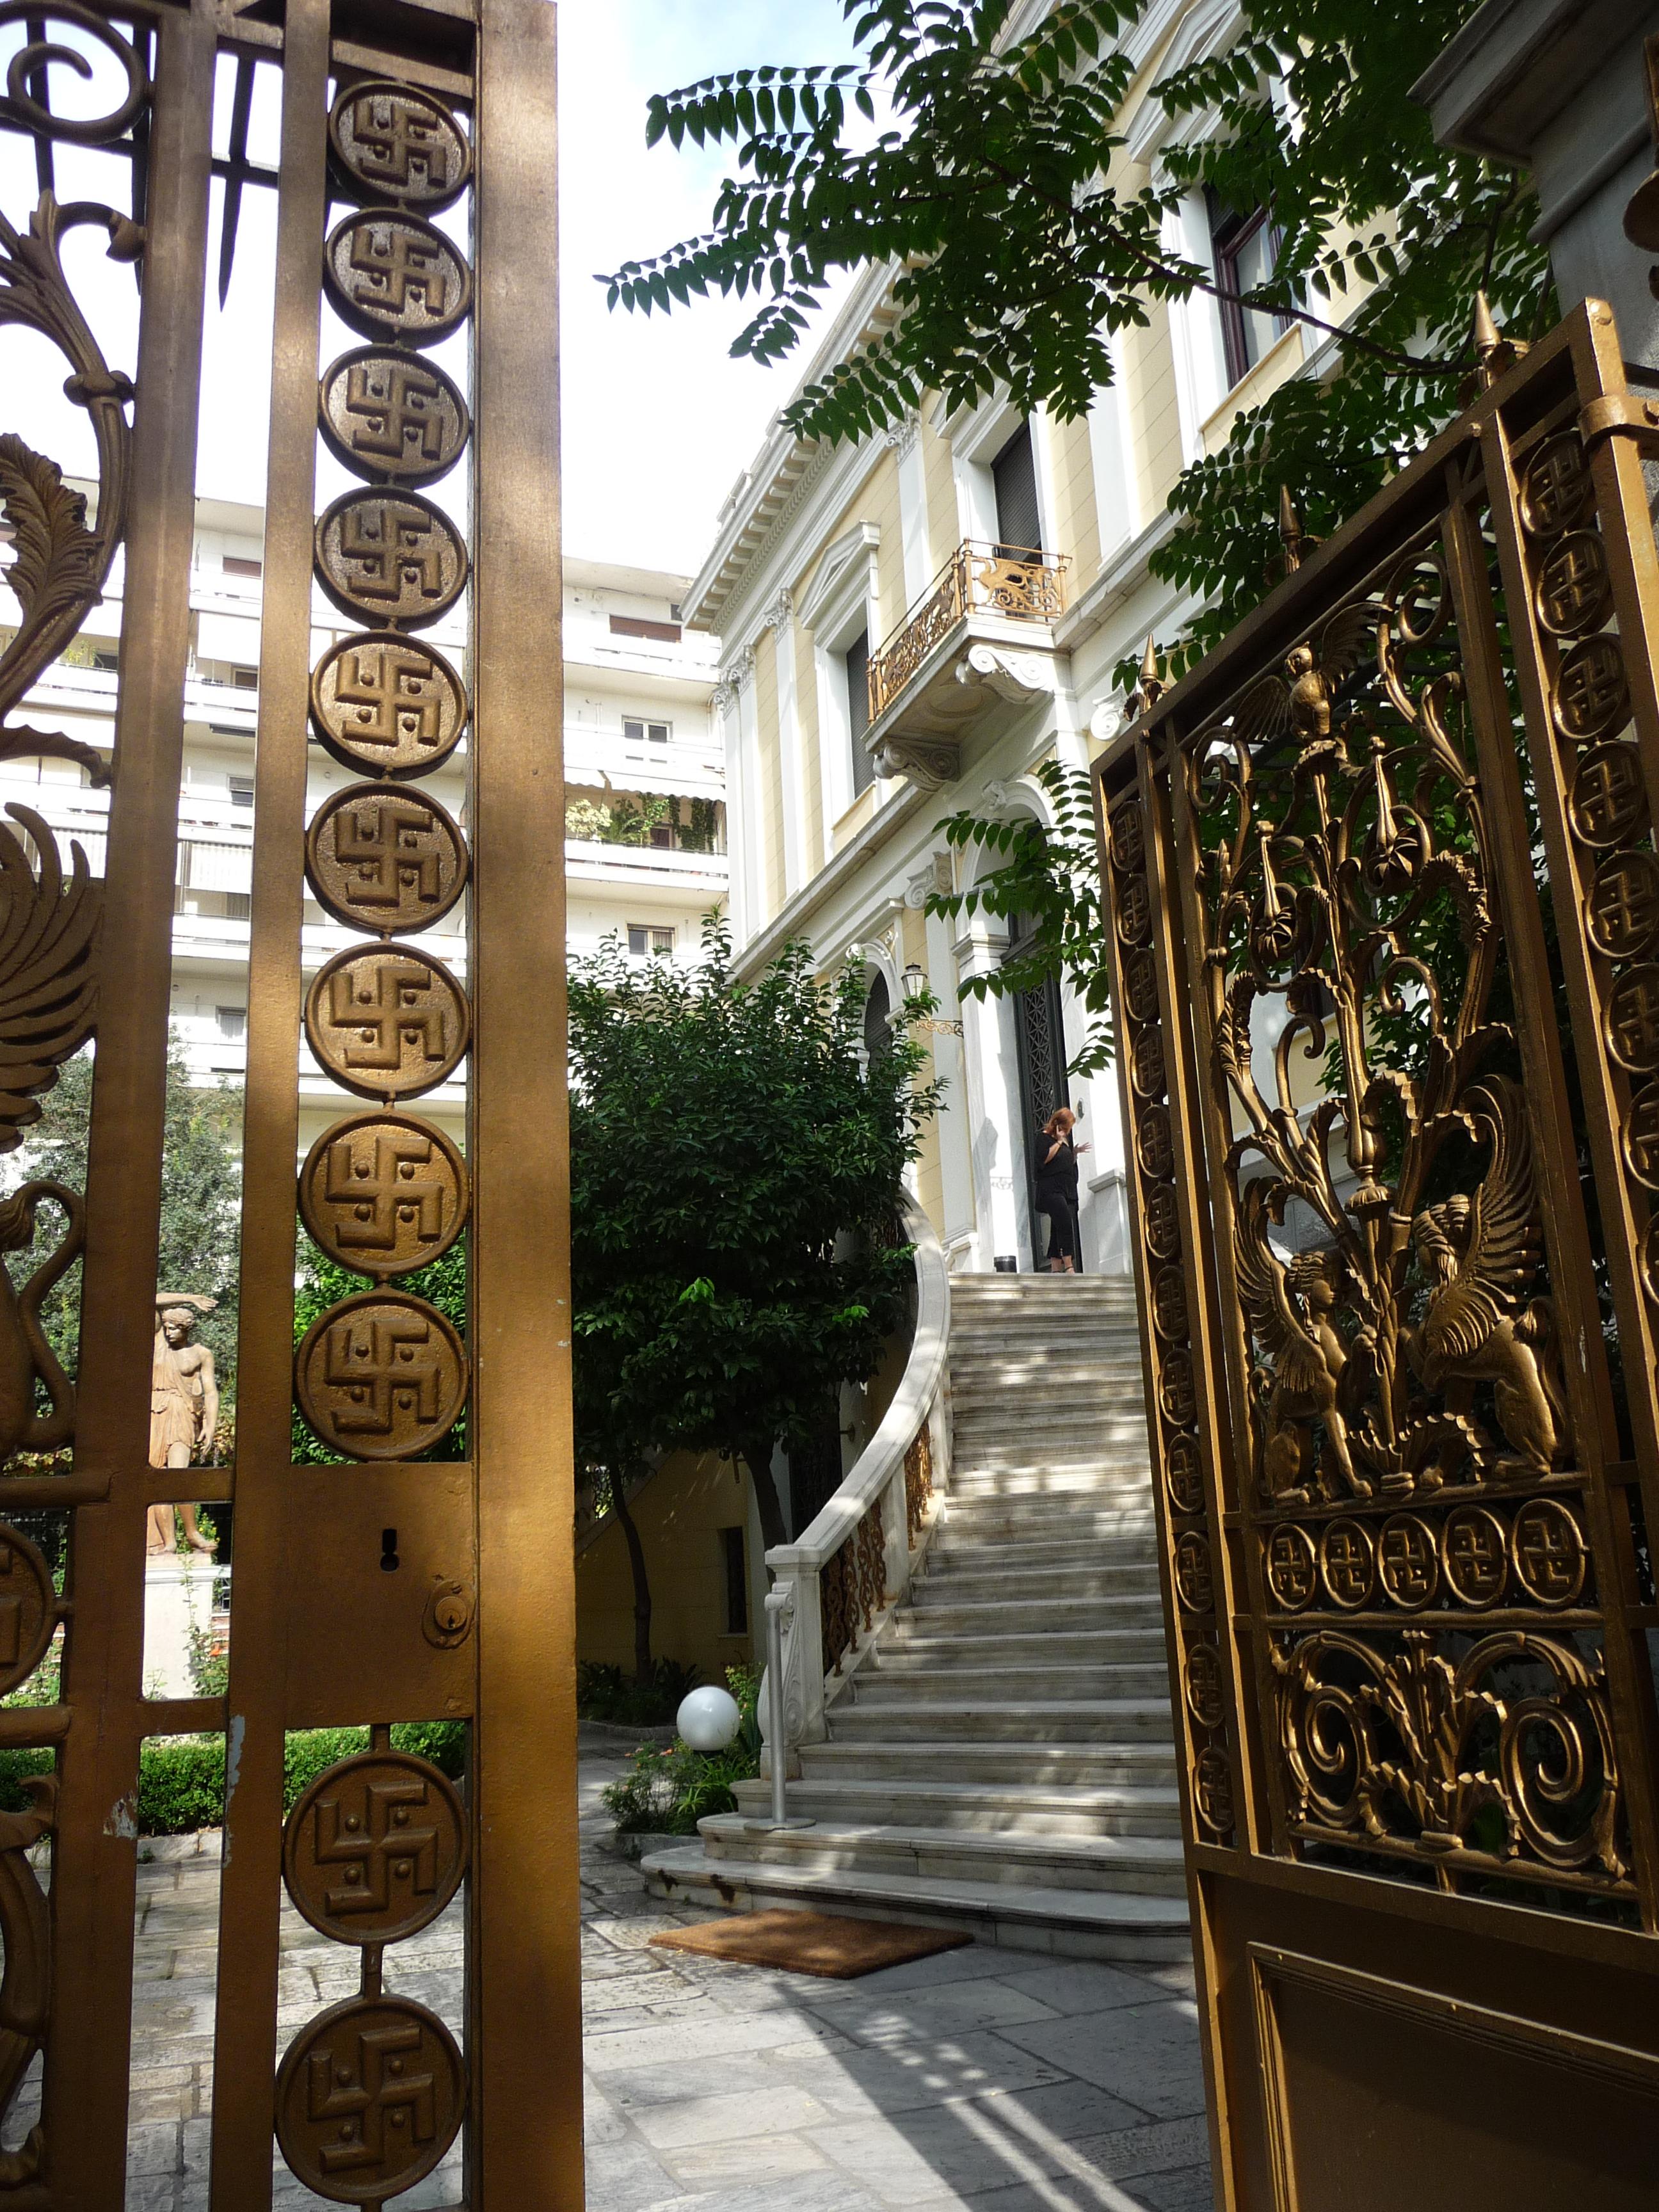 Numismatic museum tour